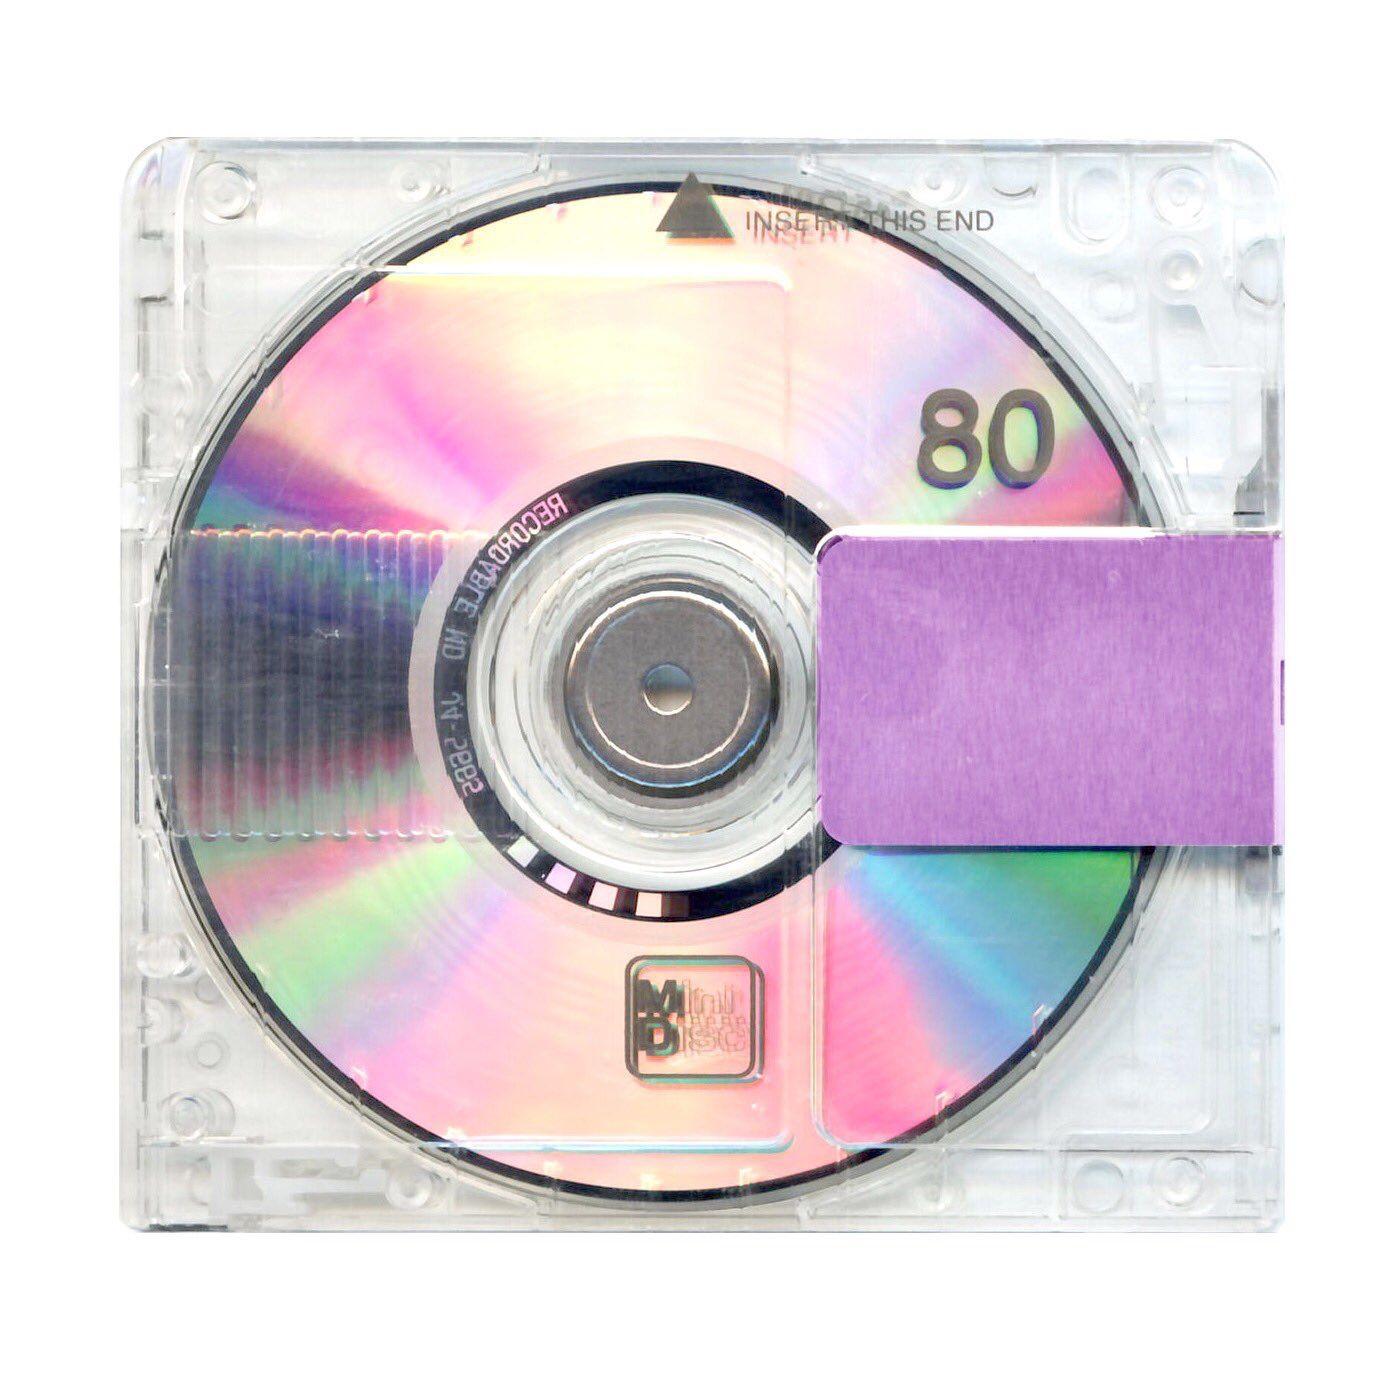 Kanye West Yandhi Music Album Cover Kanye West Albums Kanye West